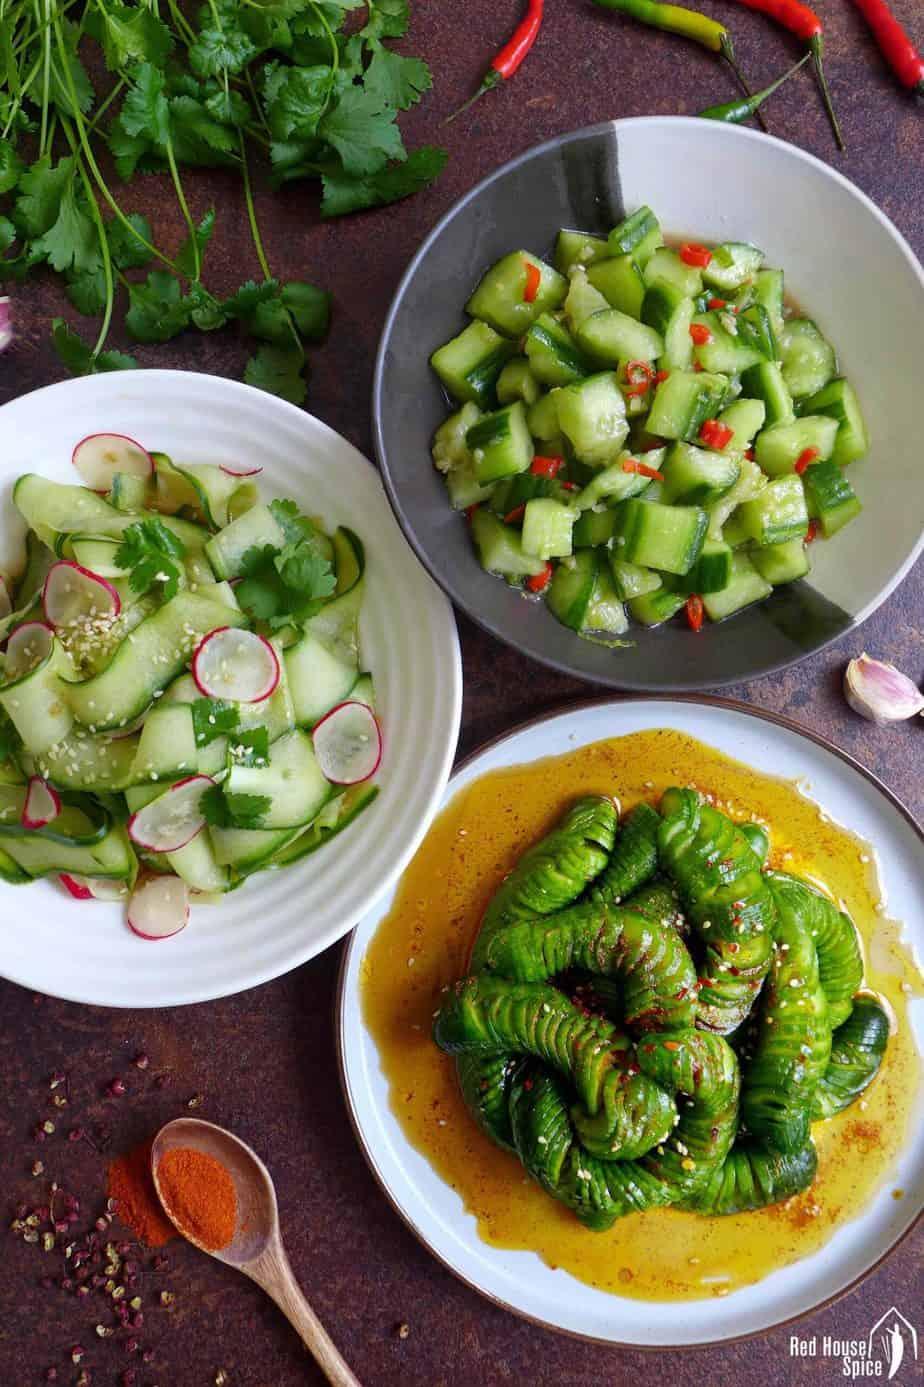 Three plates of Chinese cucumber salad